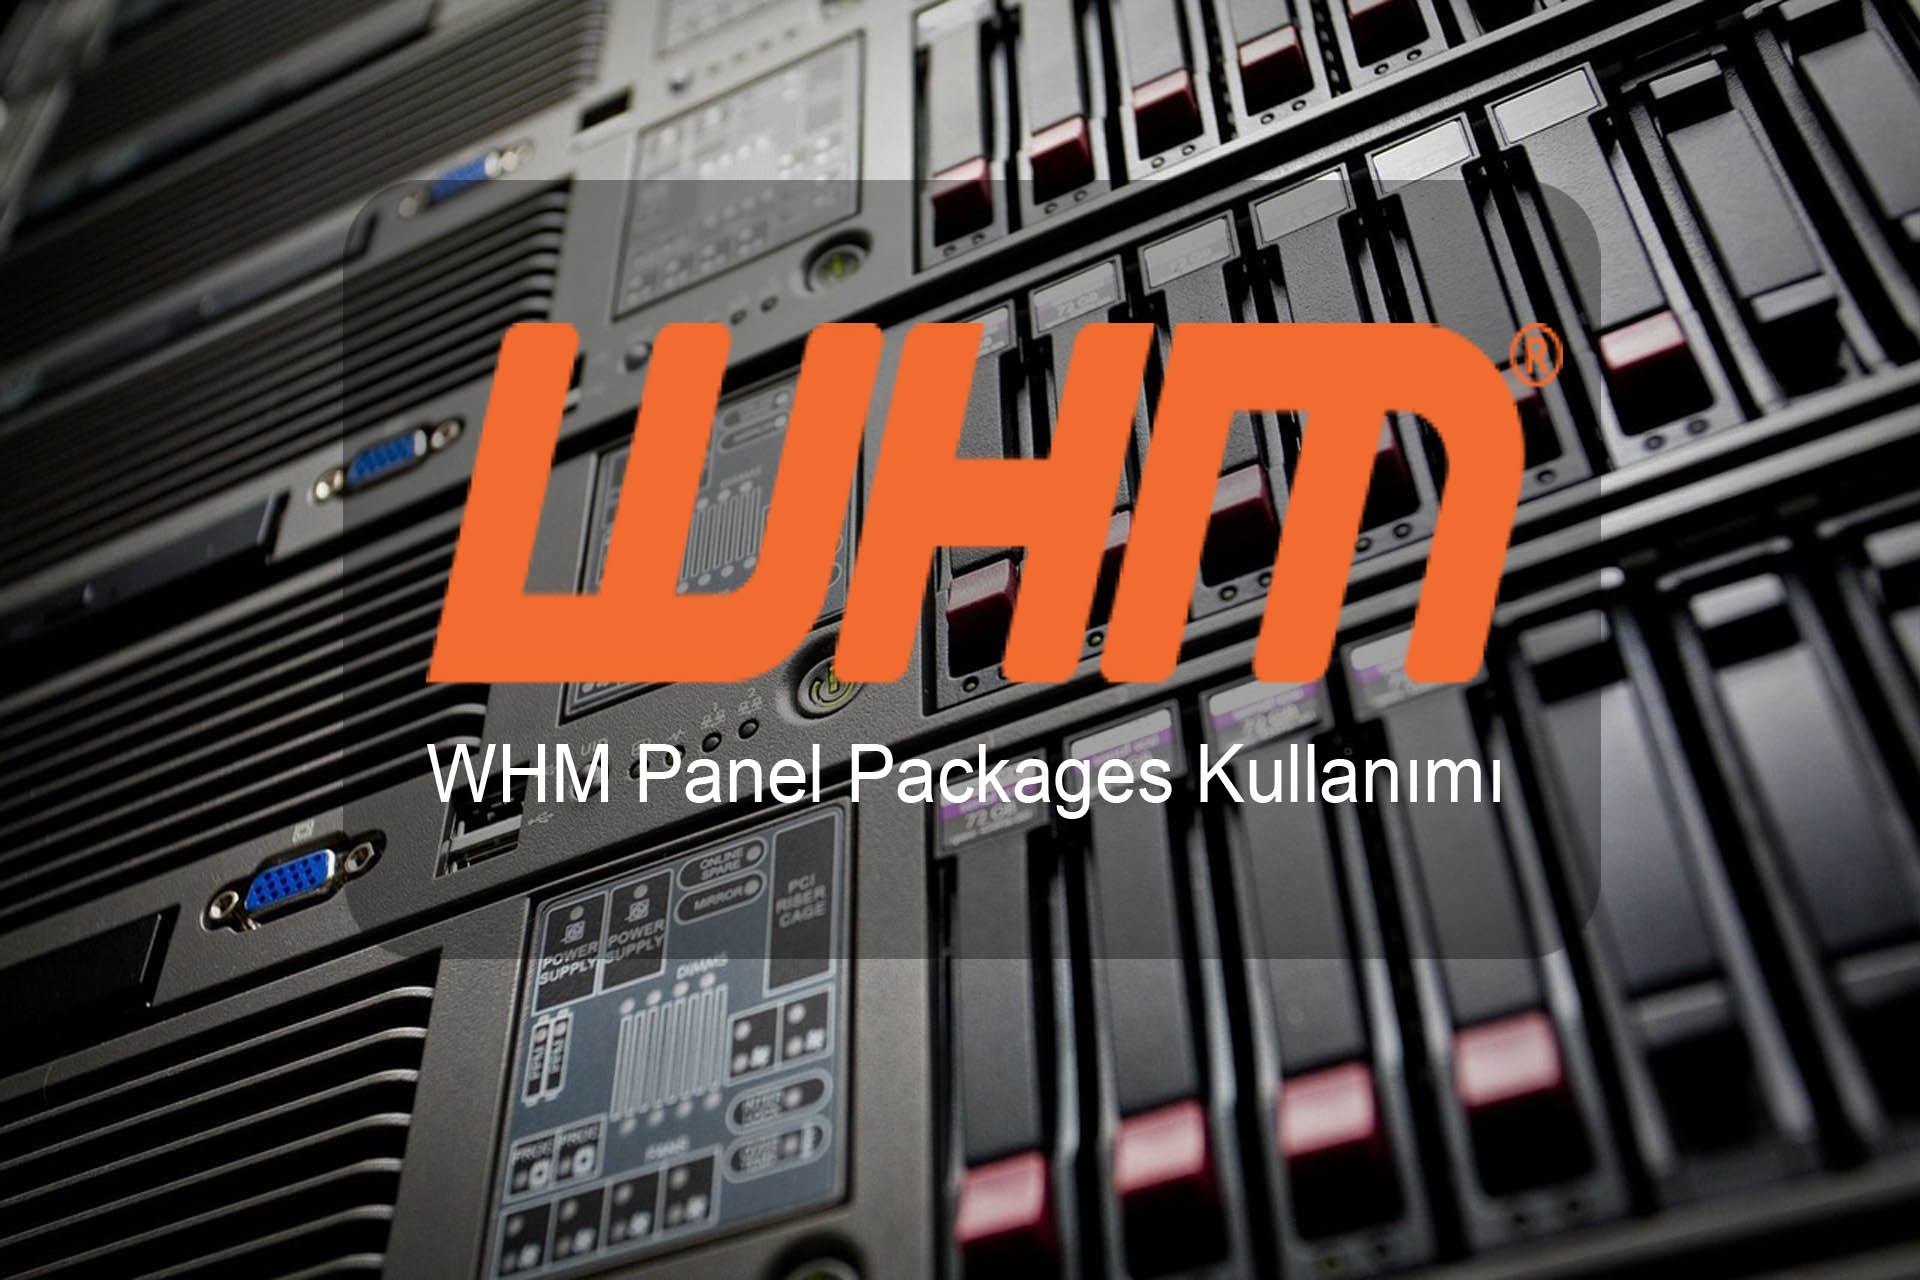 WHM Panel Packages Kullanımı